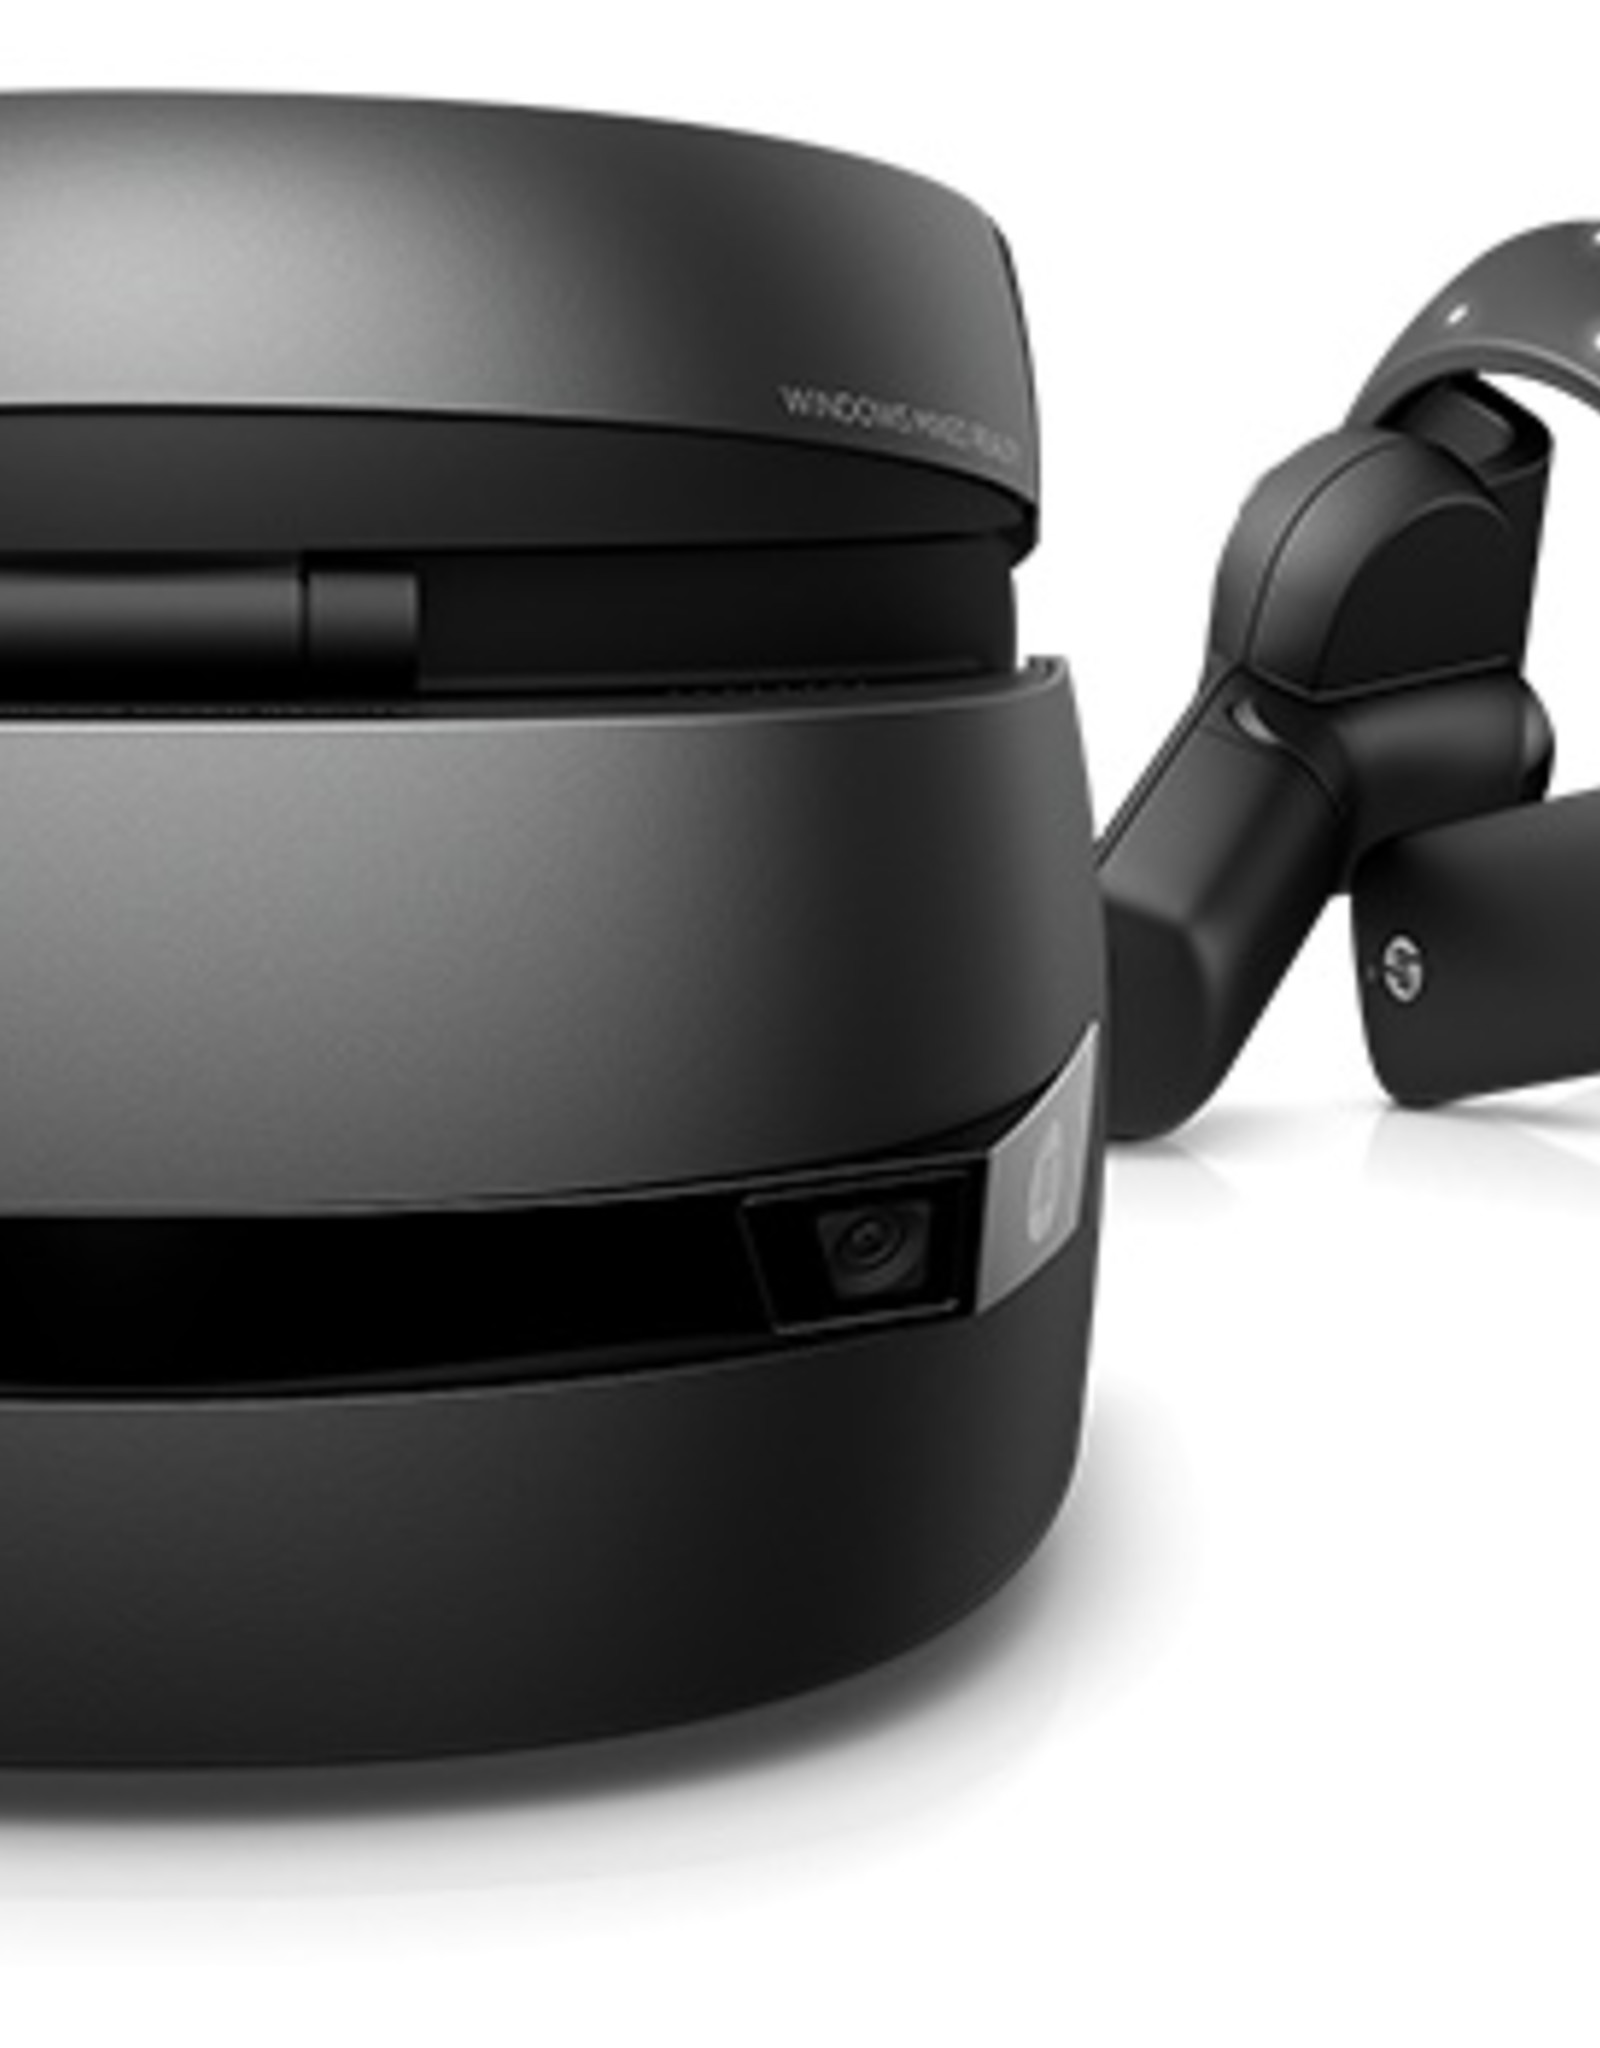 HP HP | Windows Mixed Reality VR Headset VR1000-100 w/ Controllers | 2HJ34AA#ABA